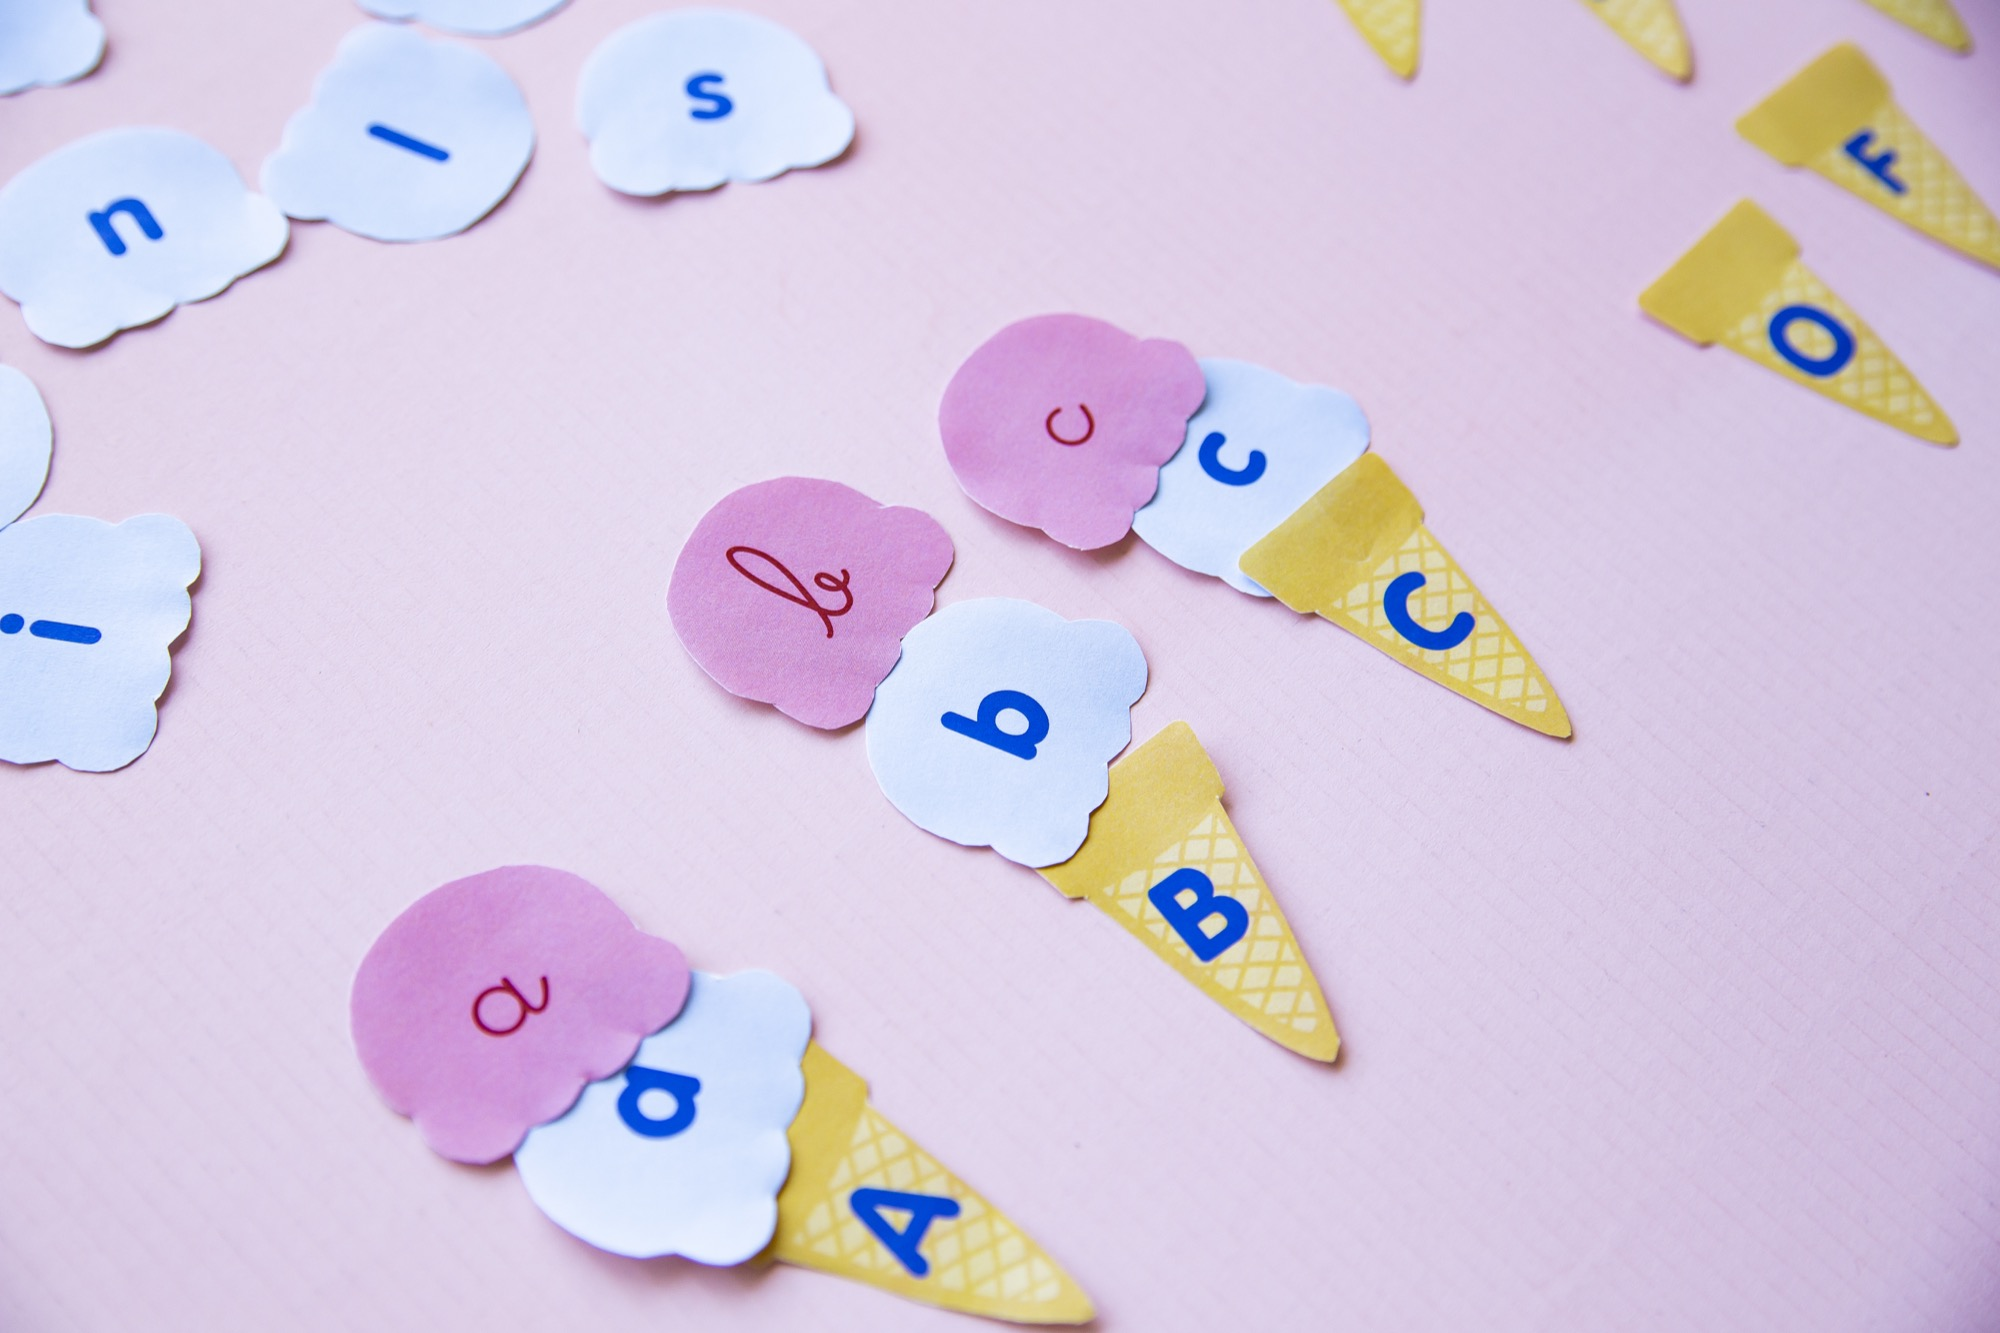 Correspondance alphabet glaces - étape 5